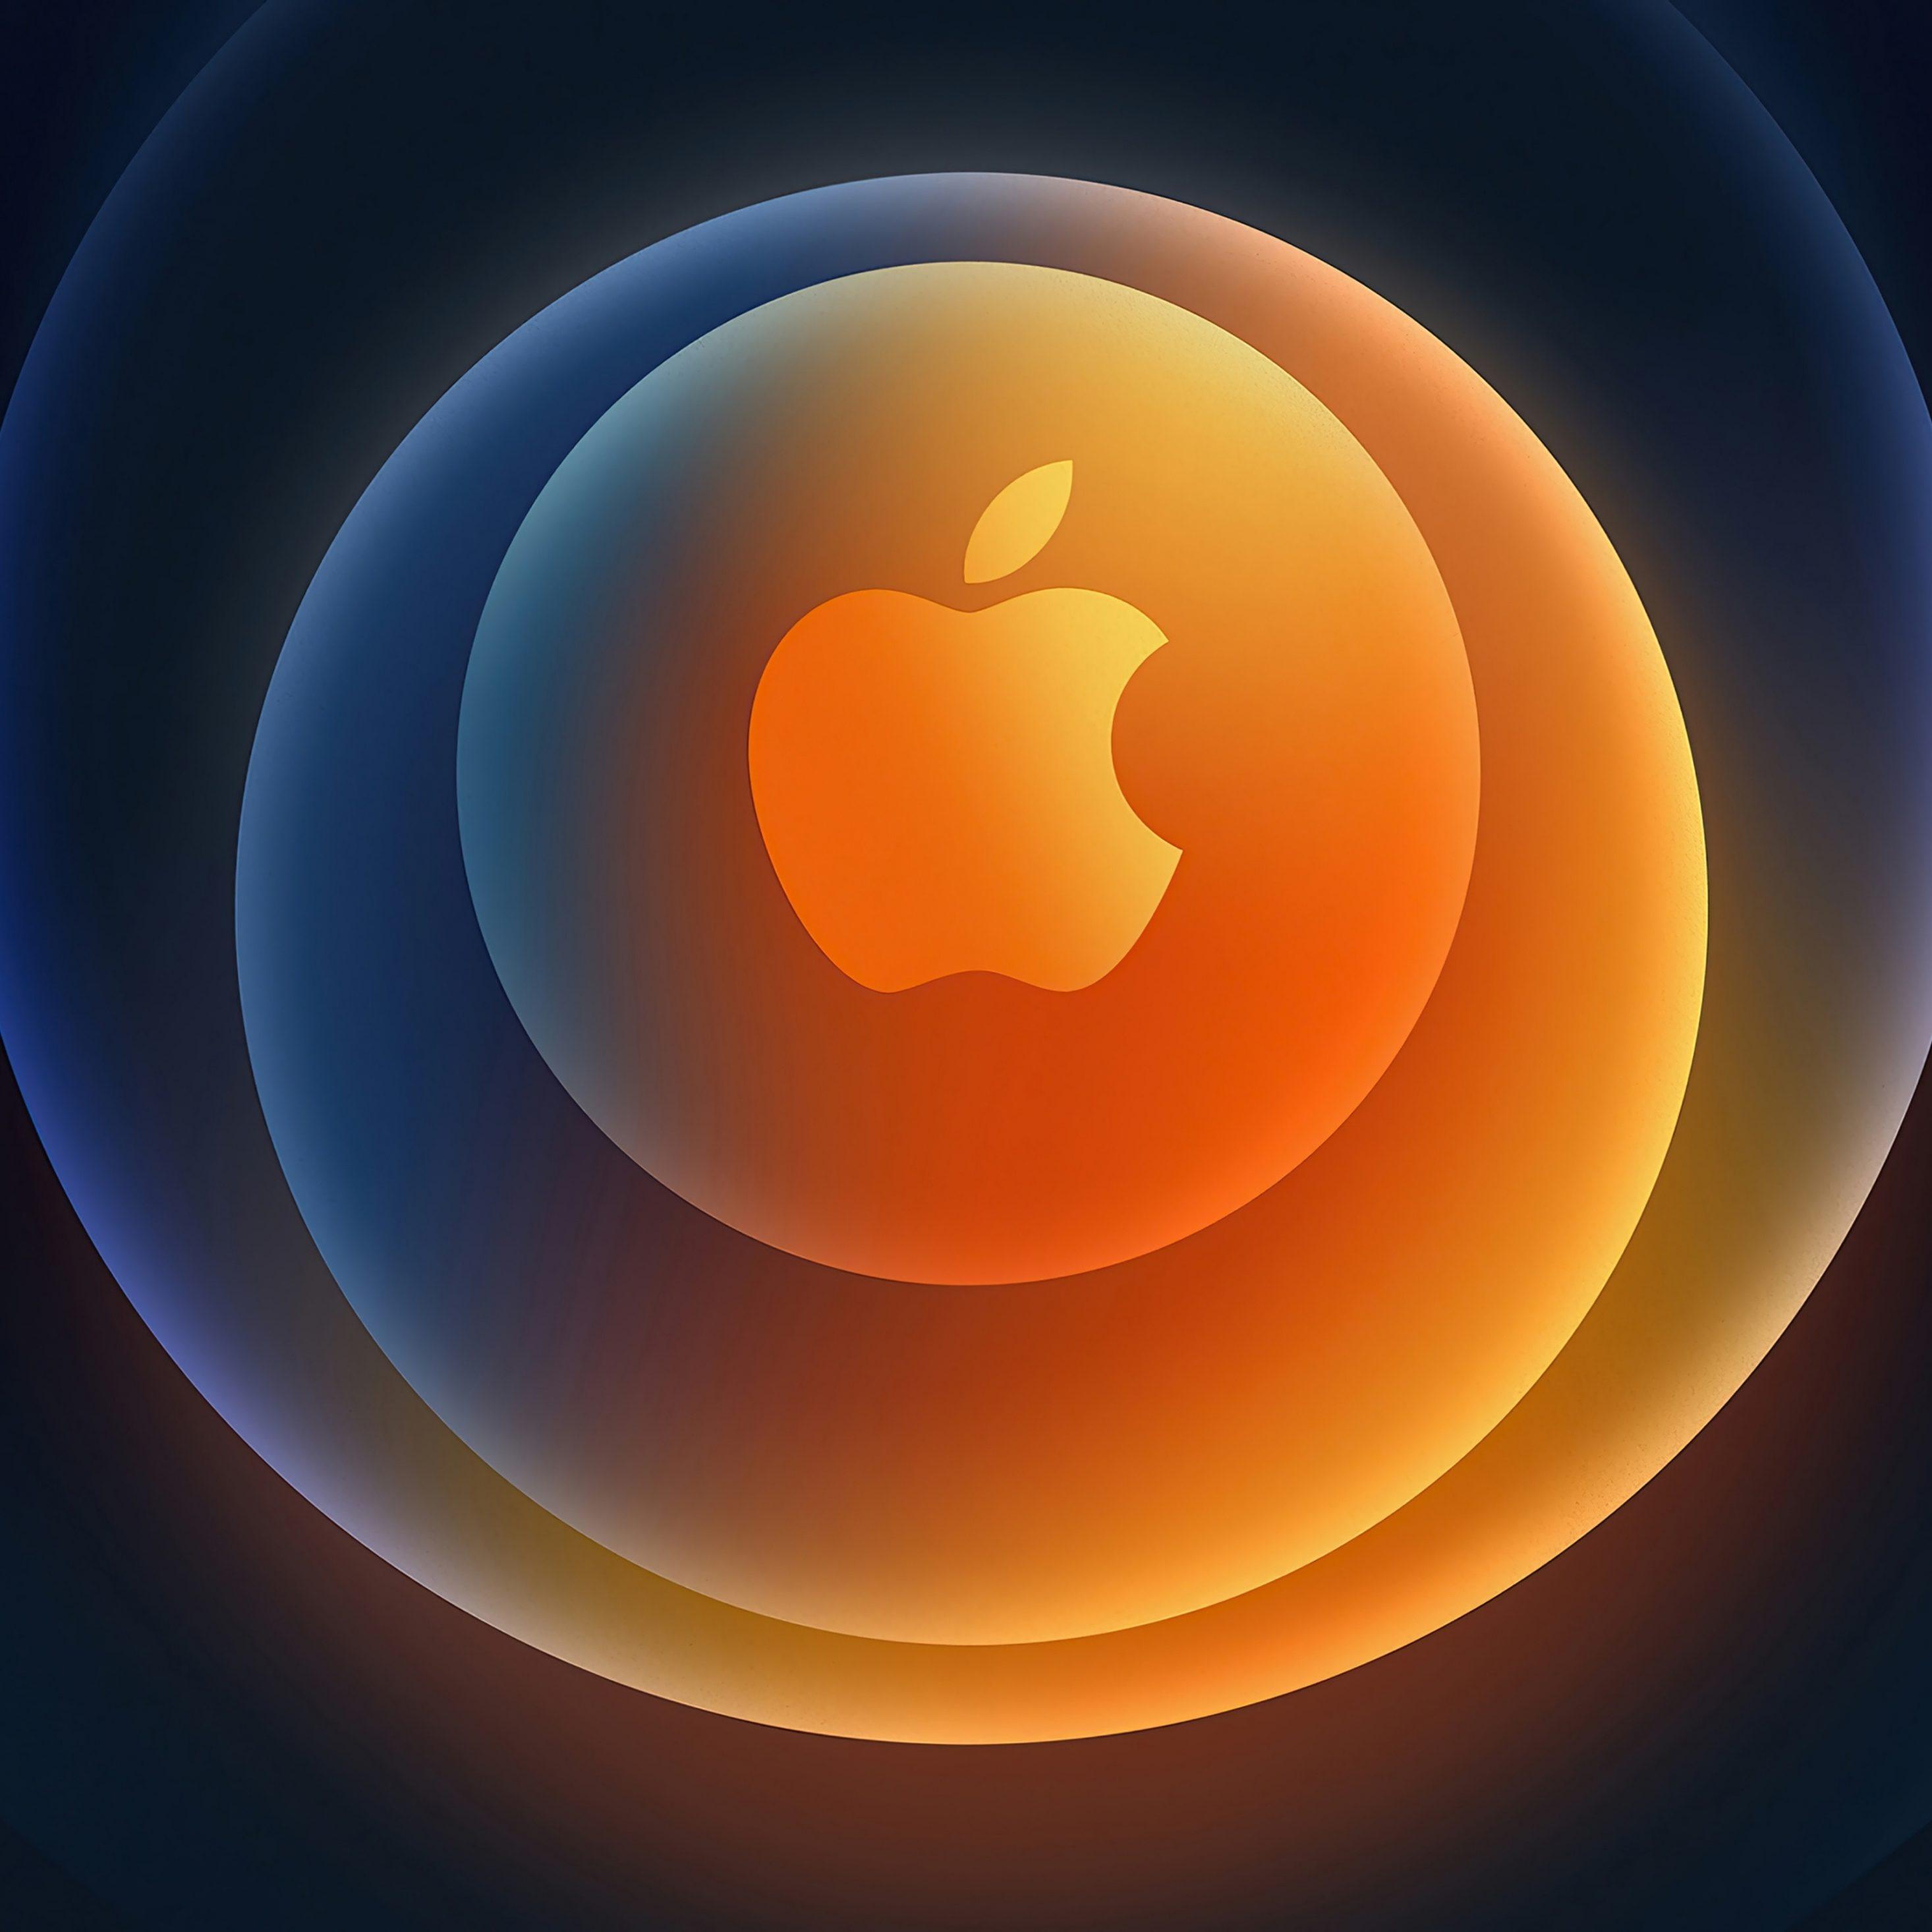 2932x2932 iPad Pro wallpaper 4k iPhone 12 Apple Logo Circles iPad Wallpaper 2932x2932 pixels resolution